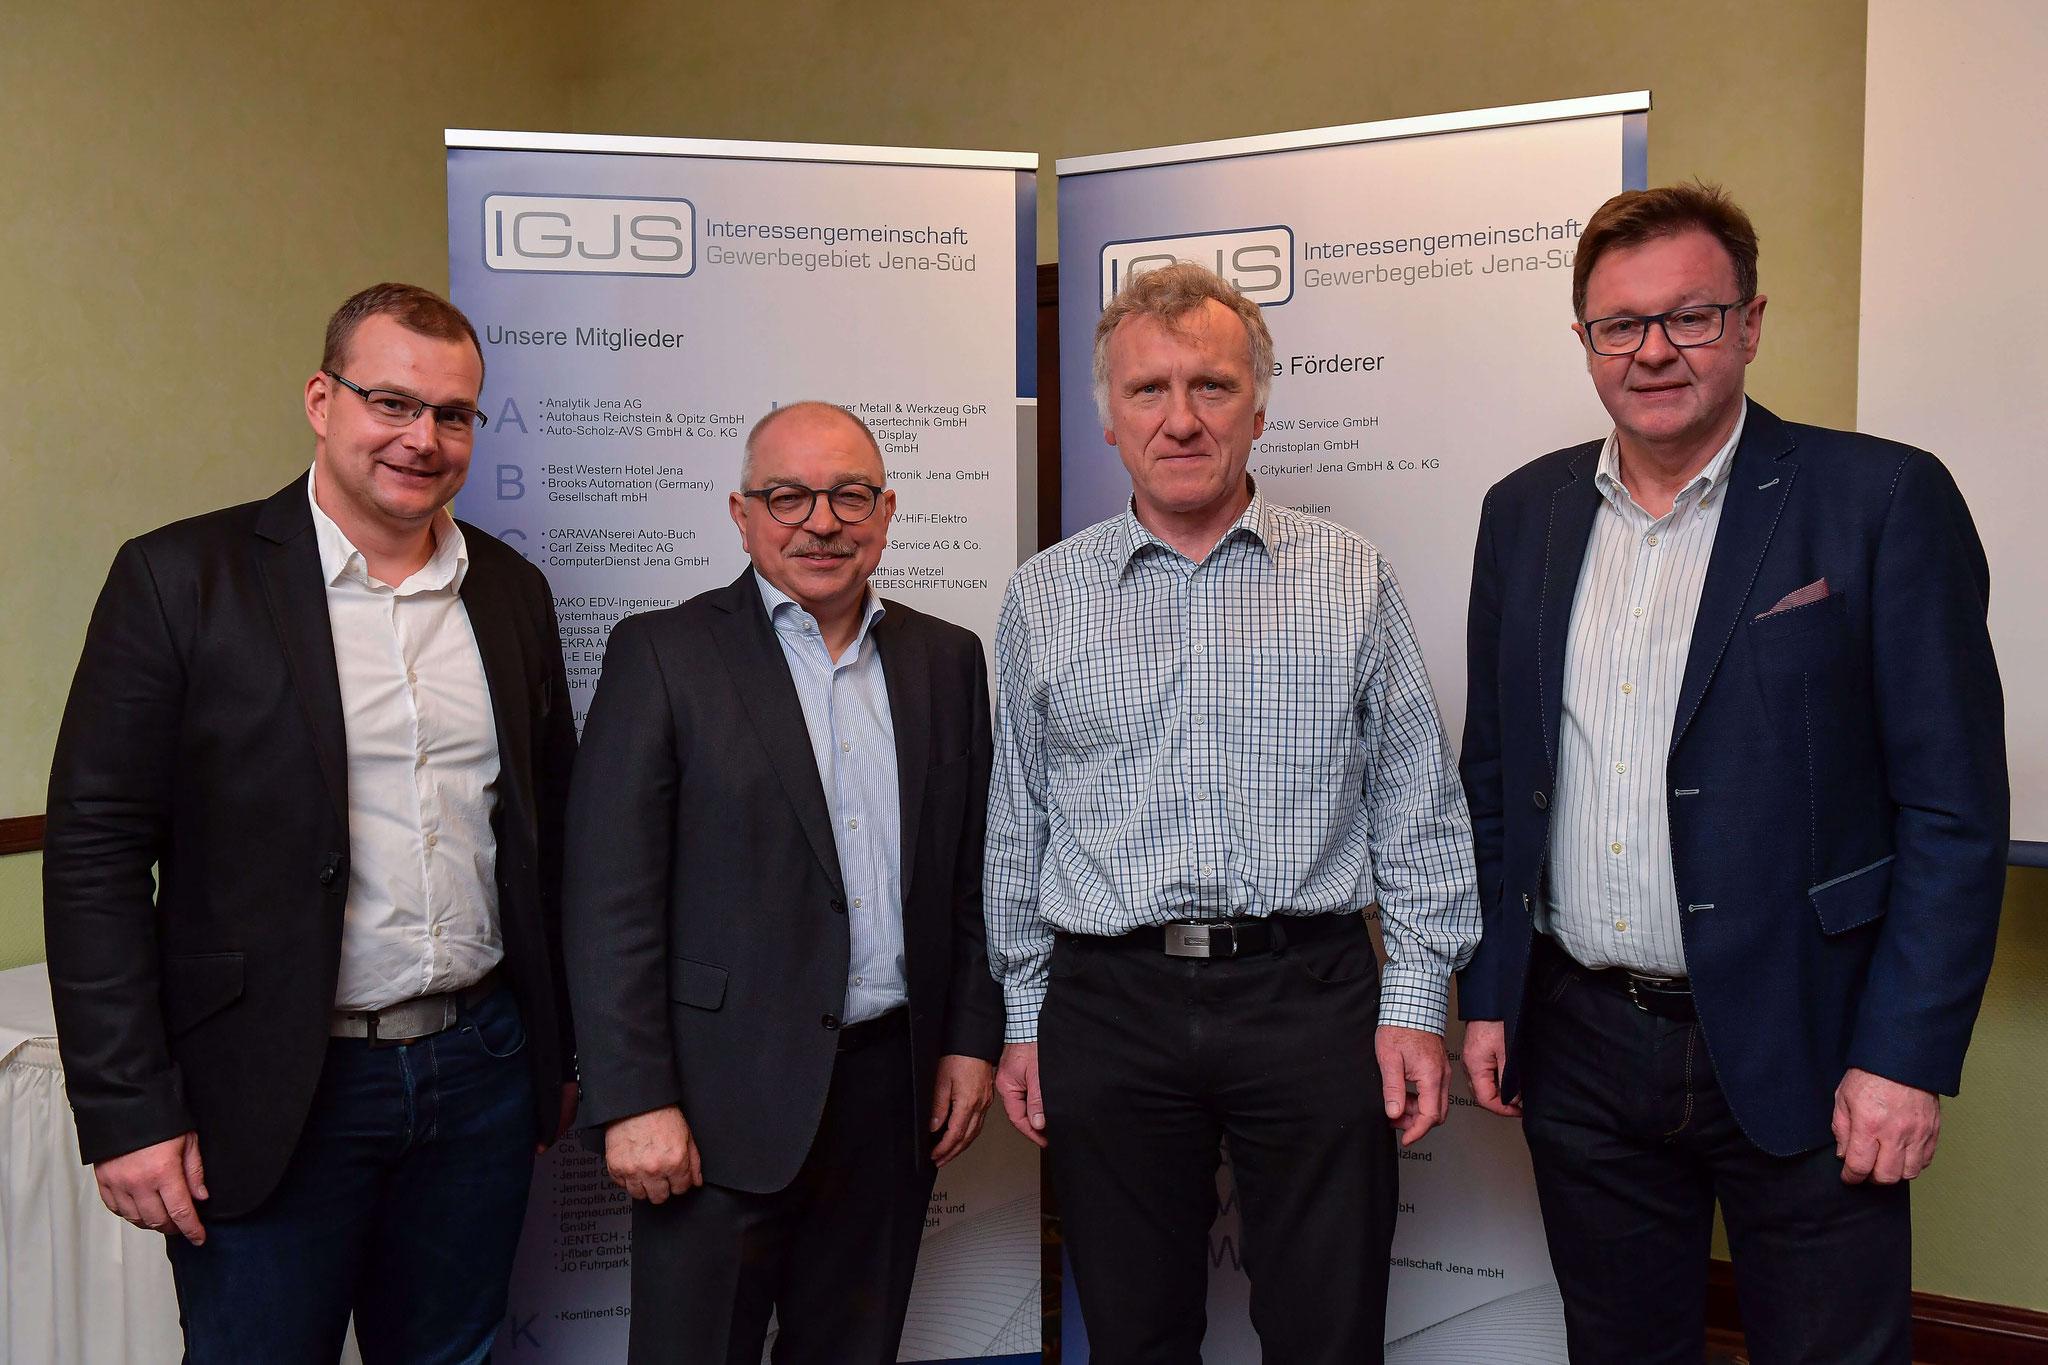 neuer Vorstand der IGJS - Andreas Steps, Wilfried Opitz, Dr. Fred Grunert, Frank Heuer (v.l.n.r.)